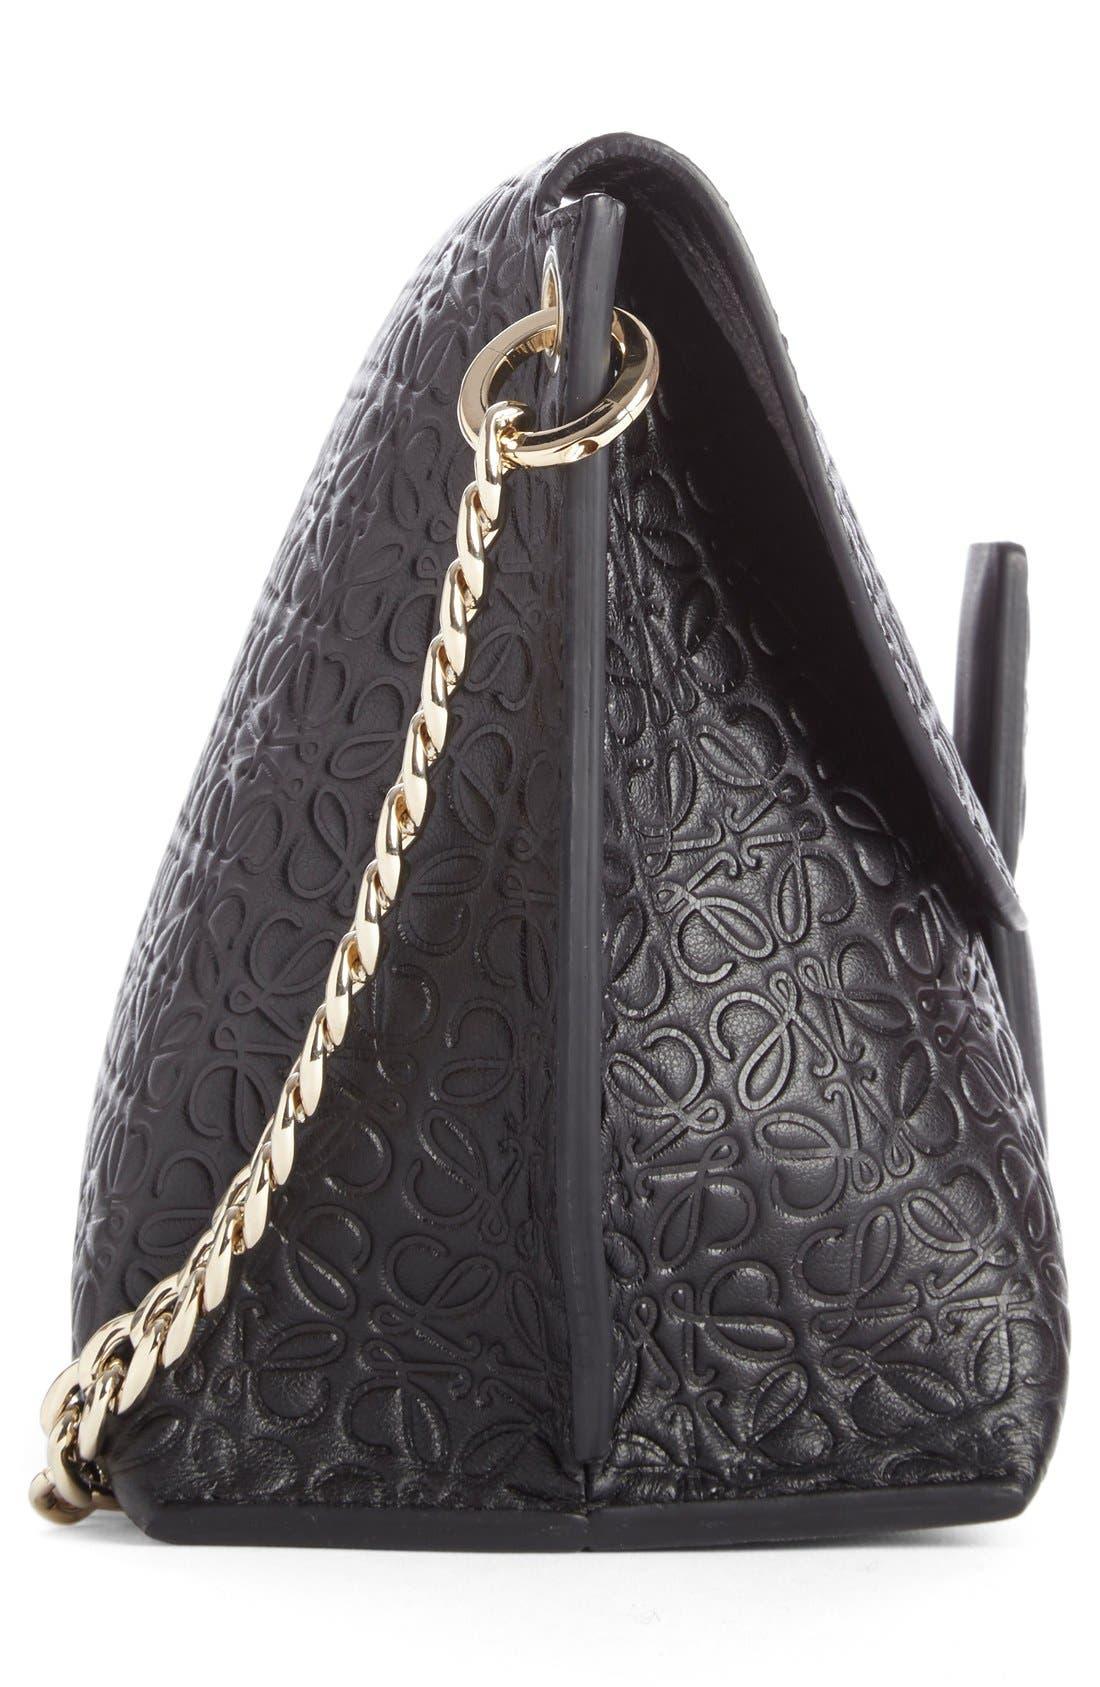 'Avenue' Embossed Calfskin Leather Crossbody Bag,                             Alternate thumbnail 3, color,                             Black